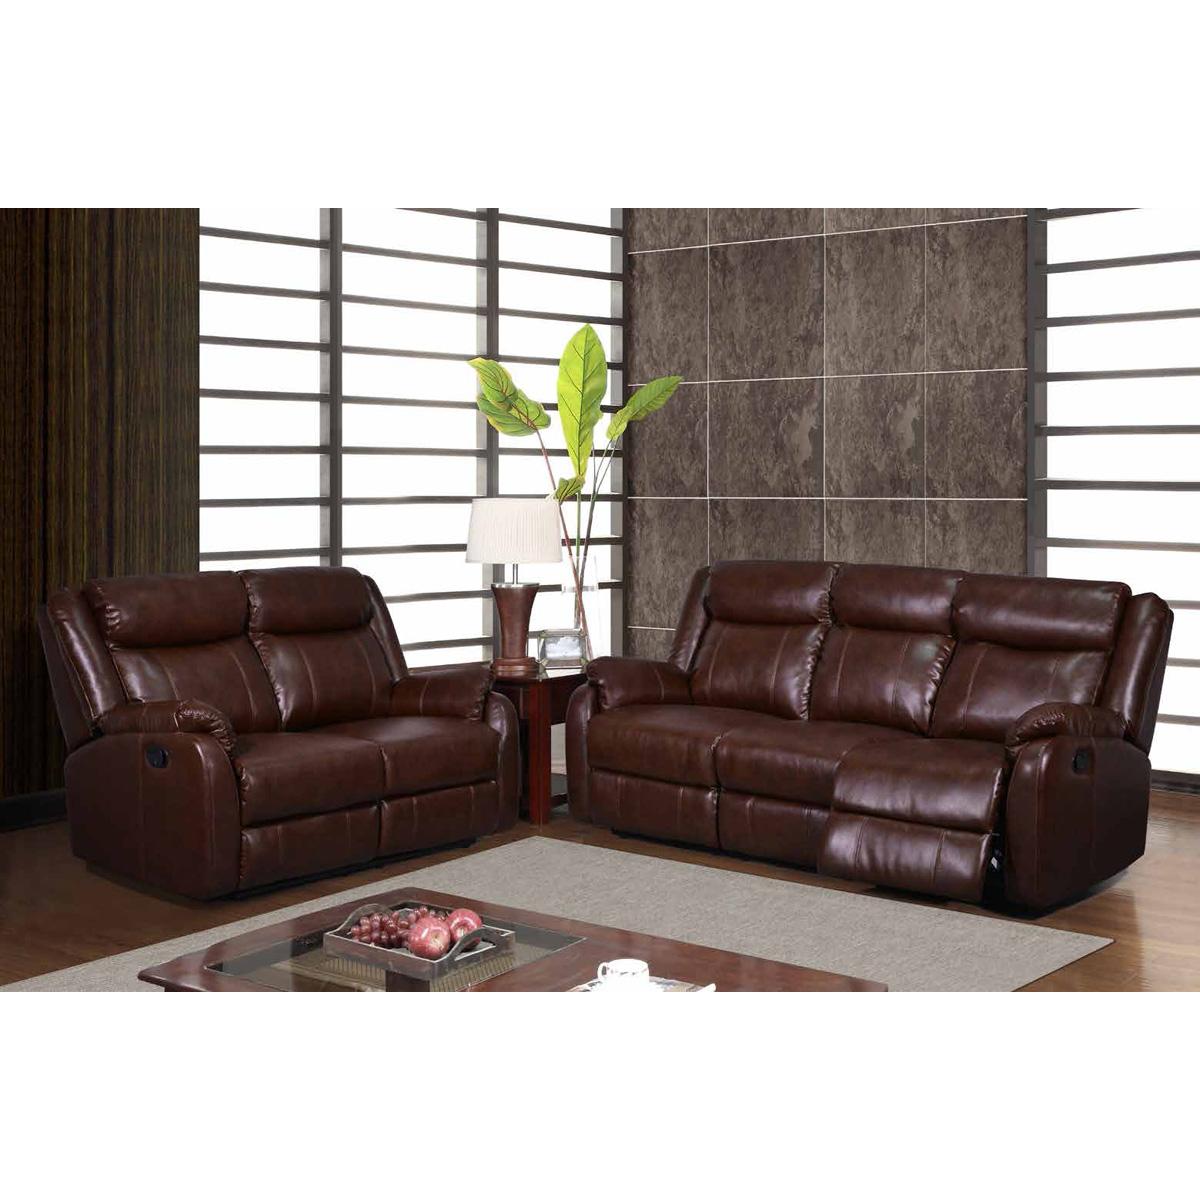 Nolan Reclining Sofa Set Brown Leather Glo U9303c Br